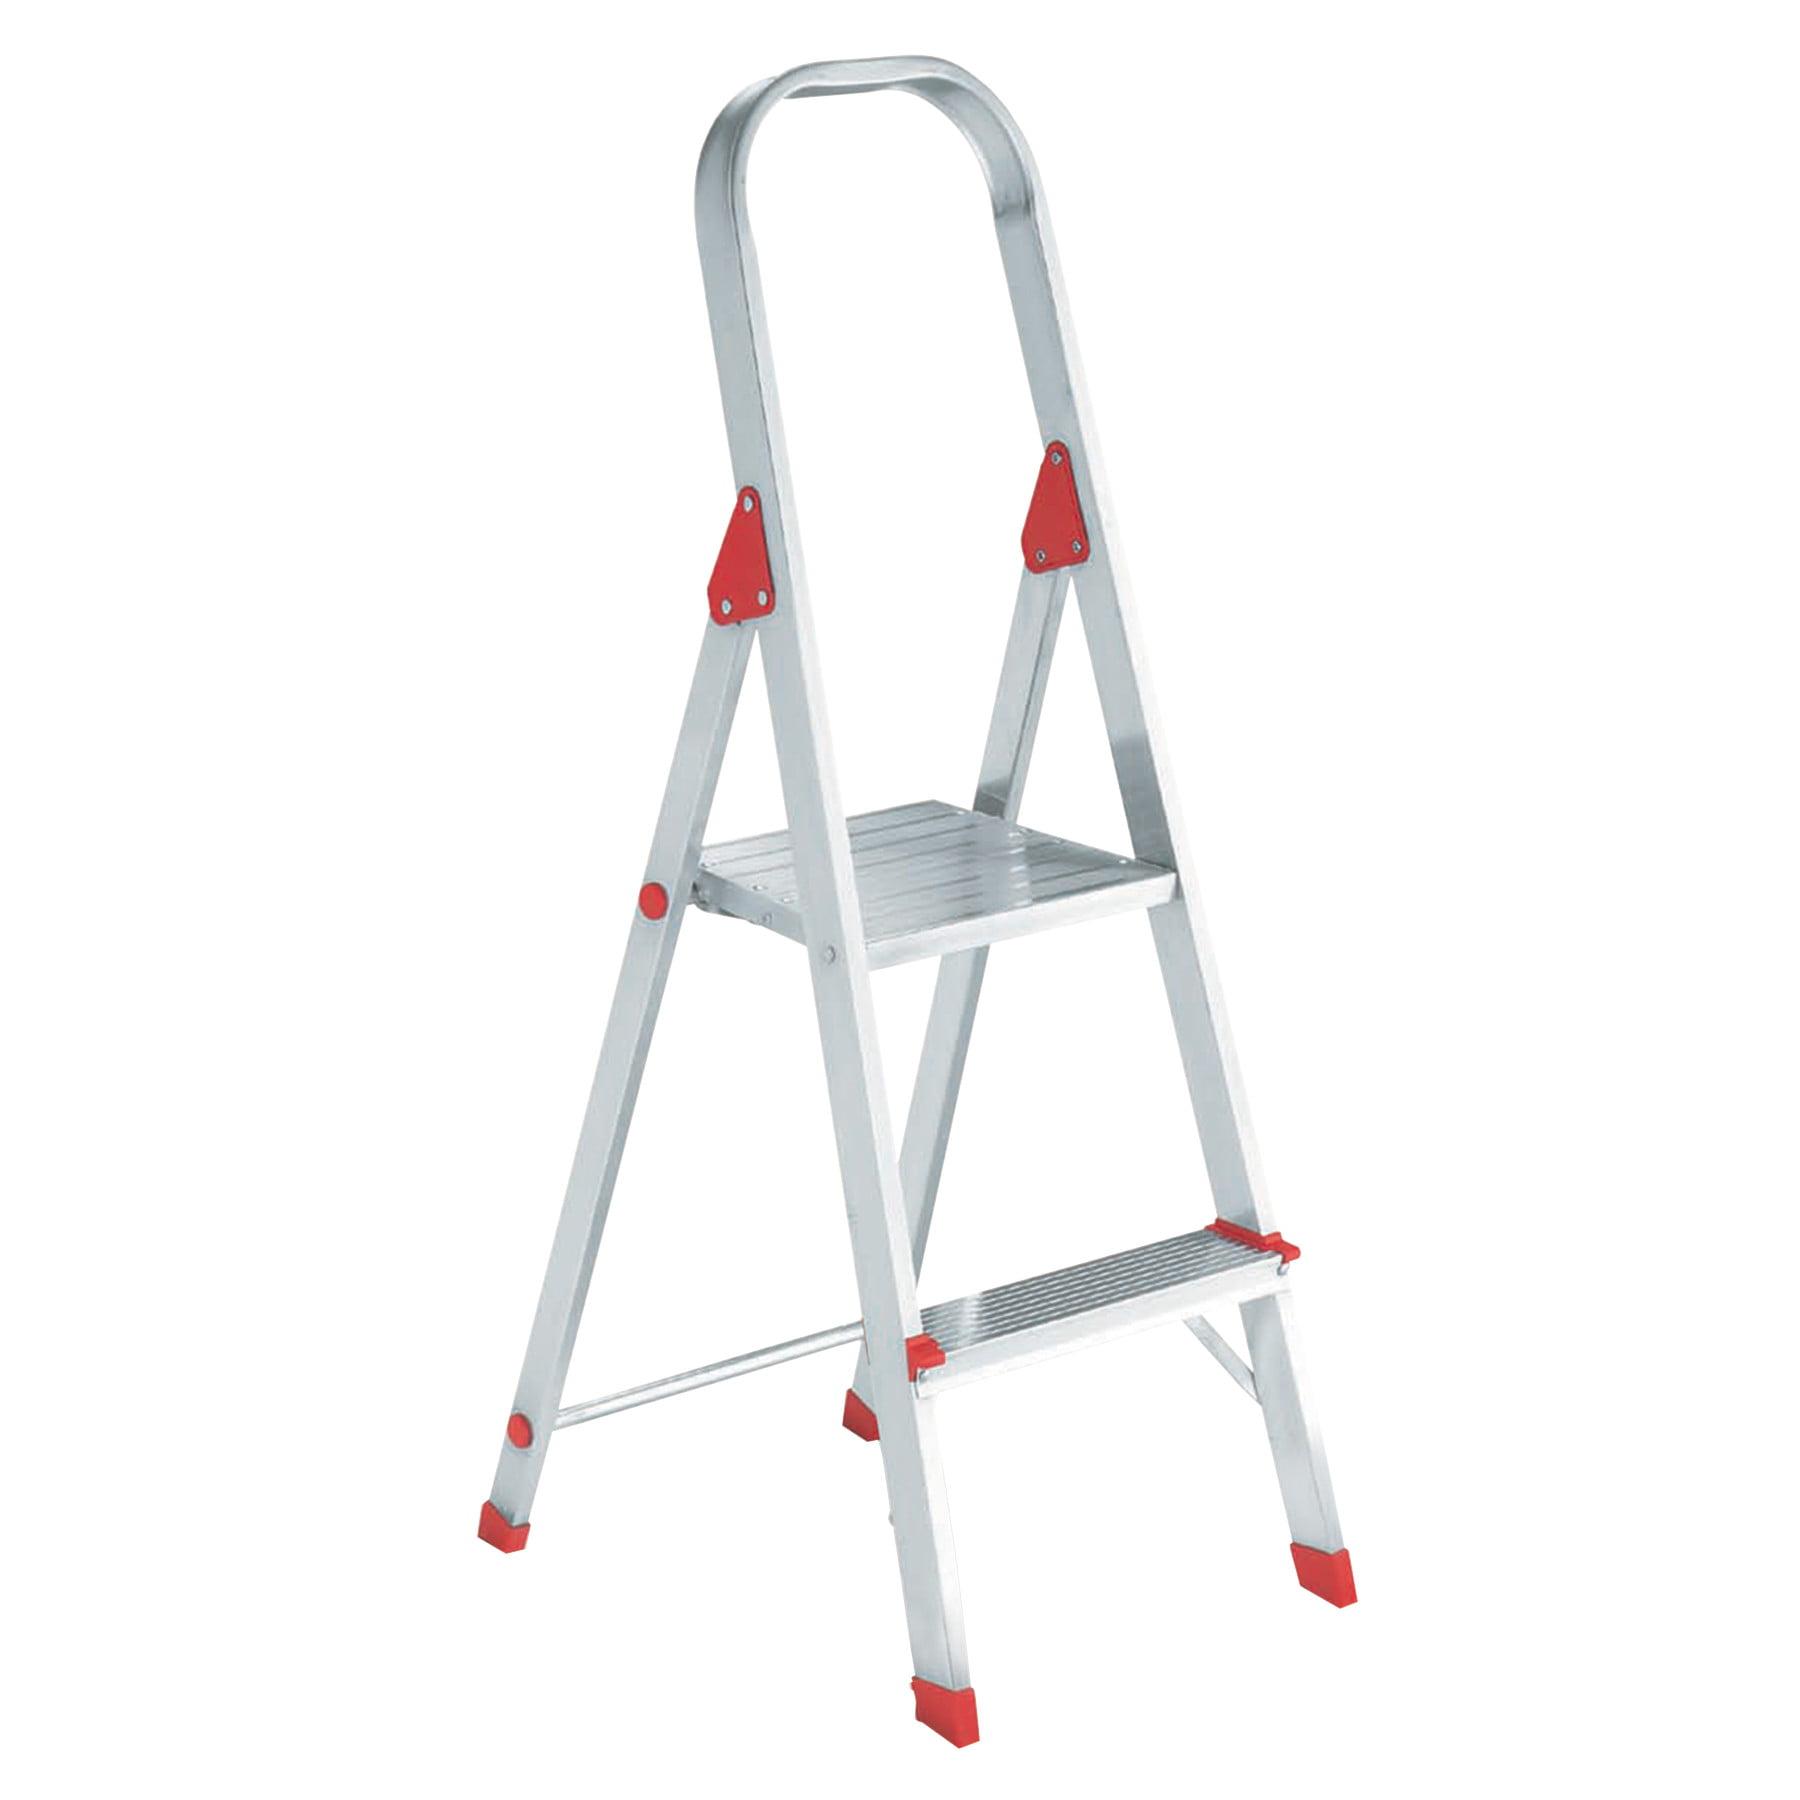 Louisville #566 Folding Aluminum Euro Platform Ladder, 2-Step, Red